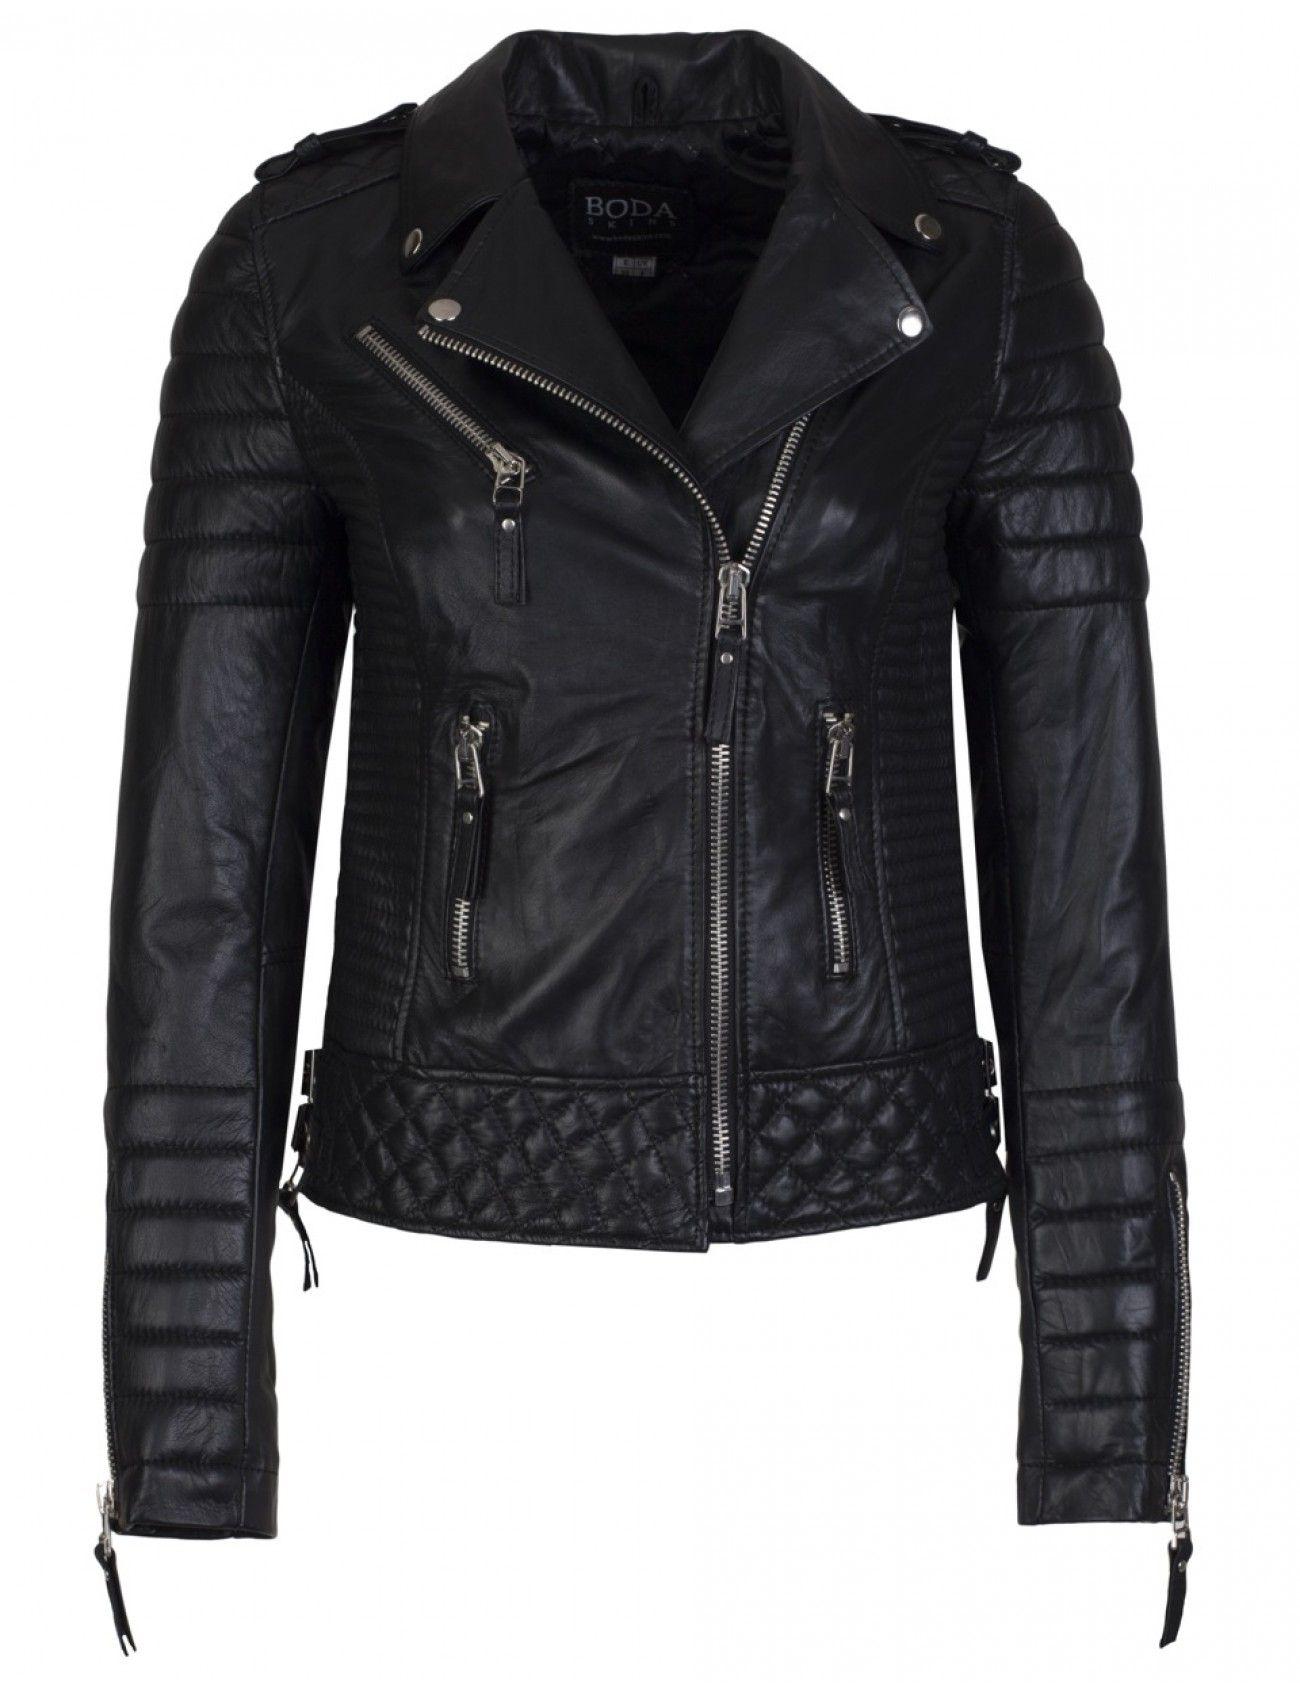 516a8ecae8f1 Boda Skins Kay Michael s Quilted Biker Jacket.  643.85   Wishlist ...